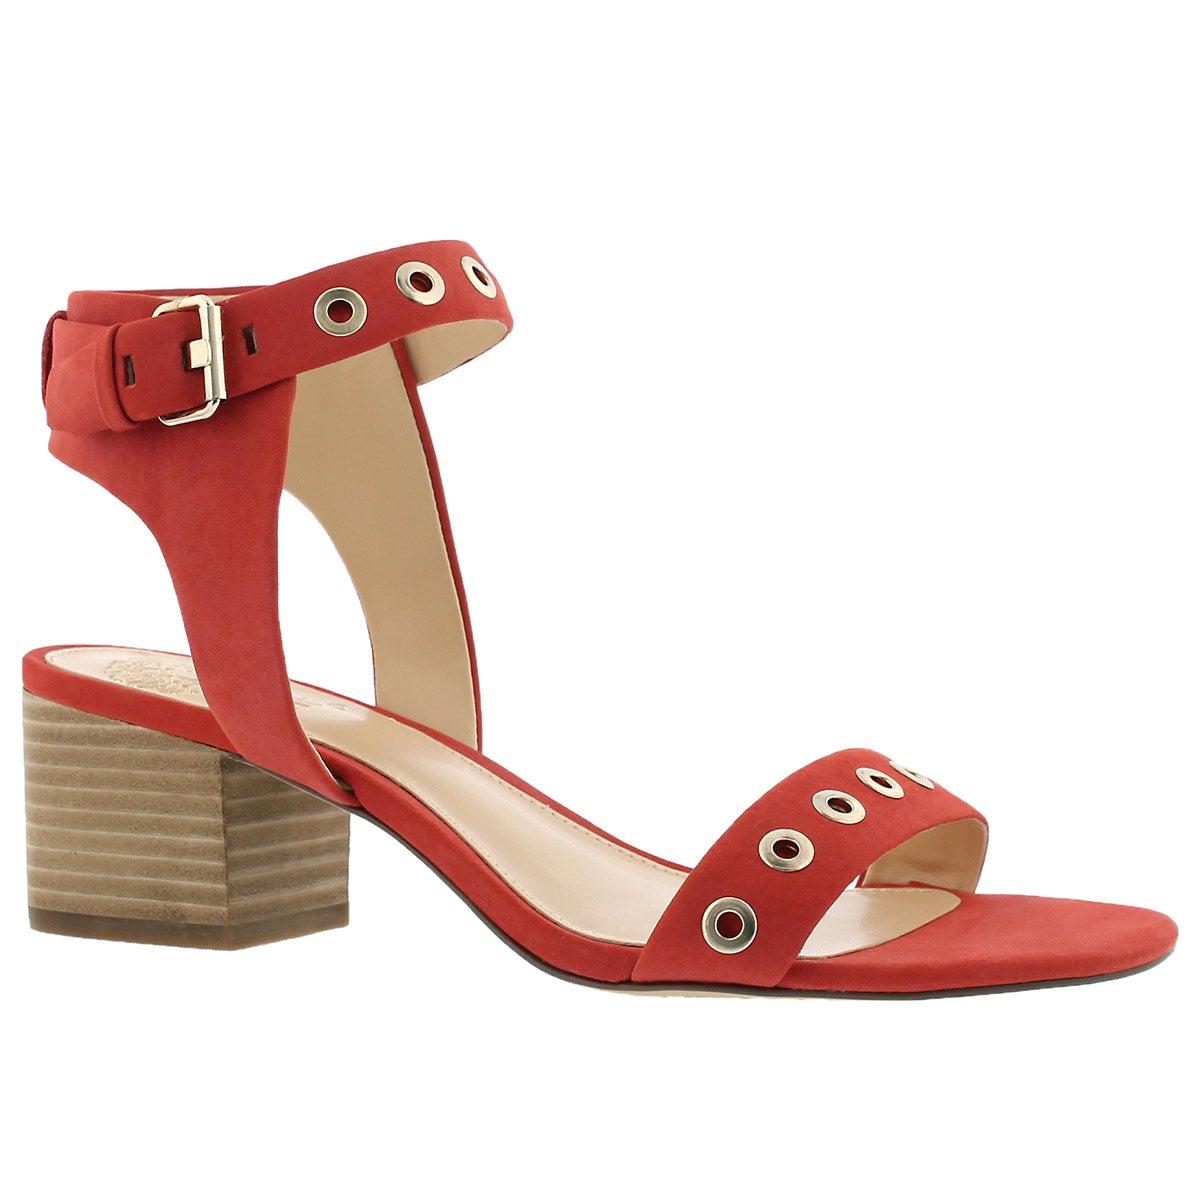 Women's FEYA king crab dress sandals